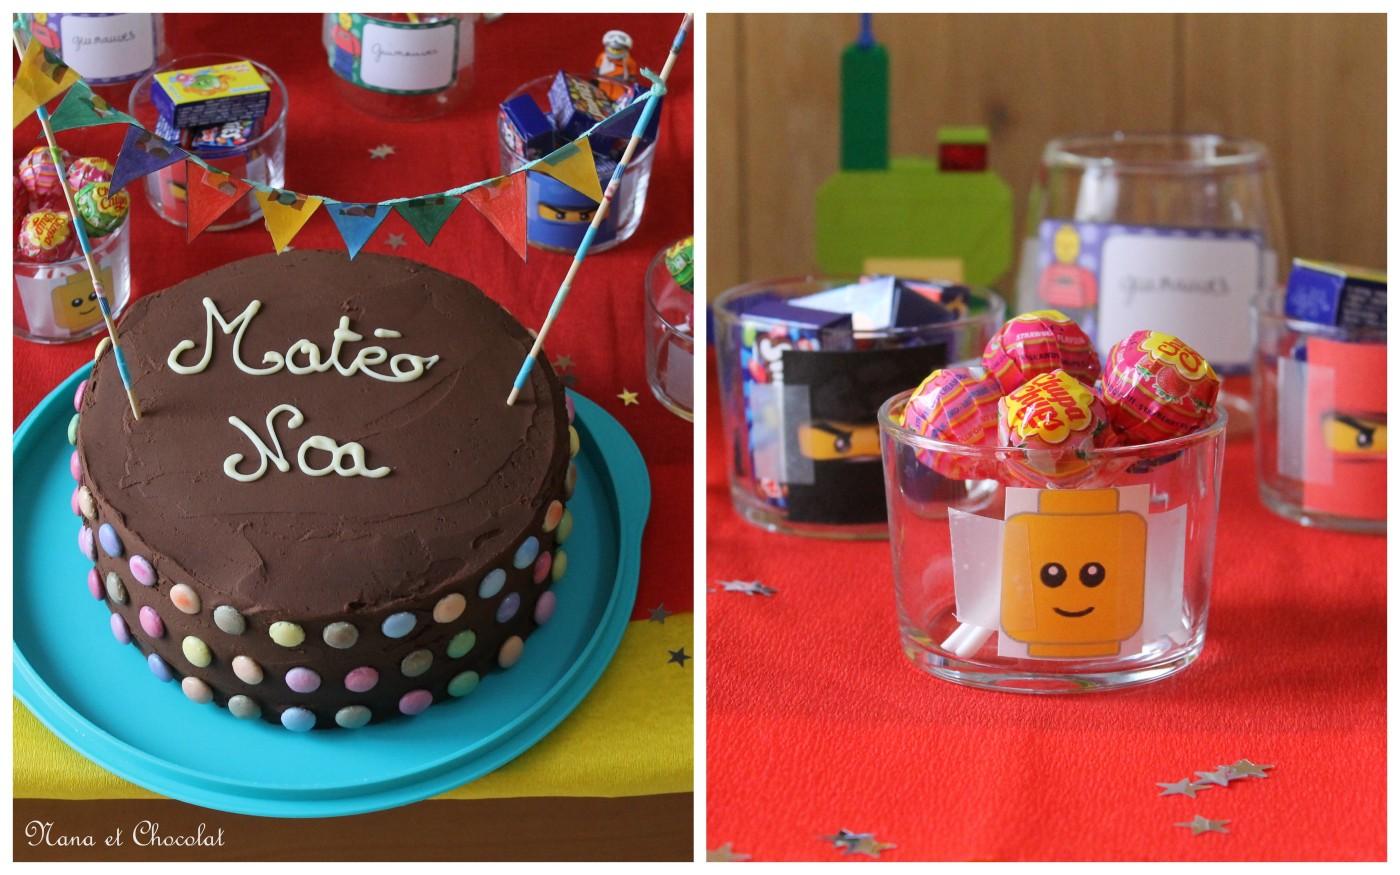 galette anniversaire matéo layer cake-003.jpg